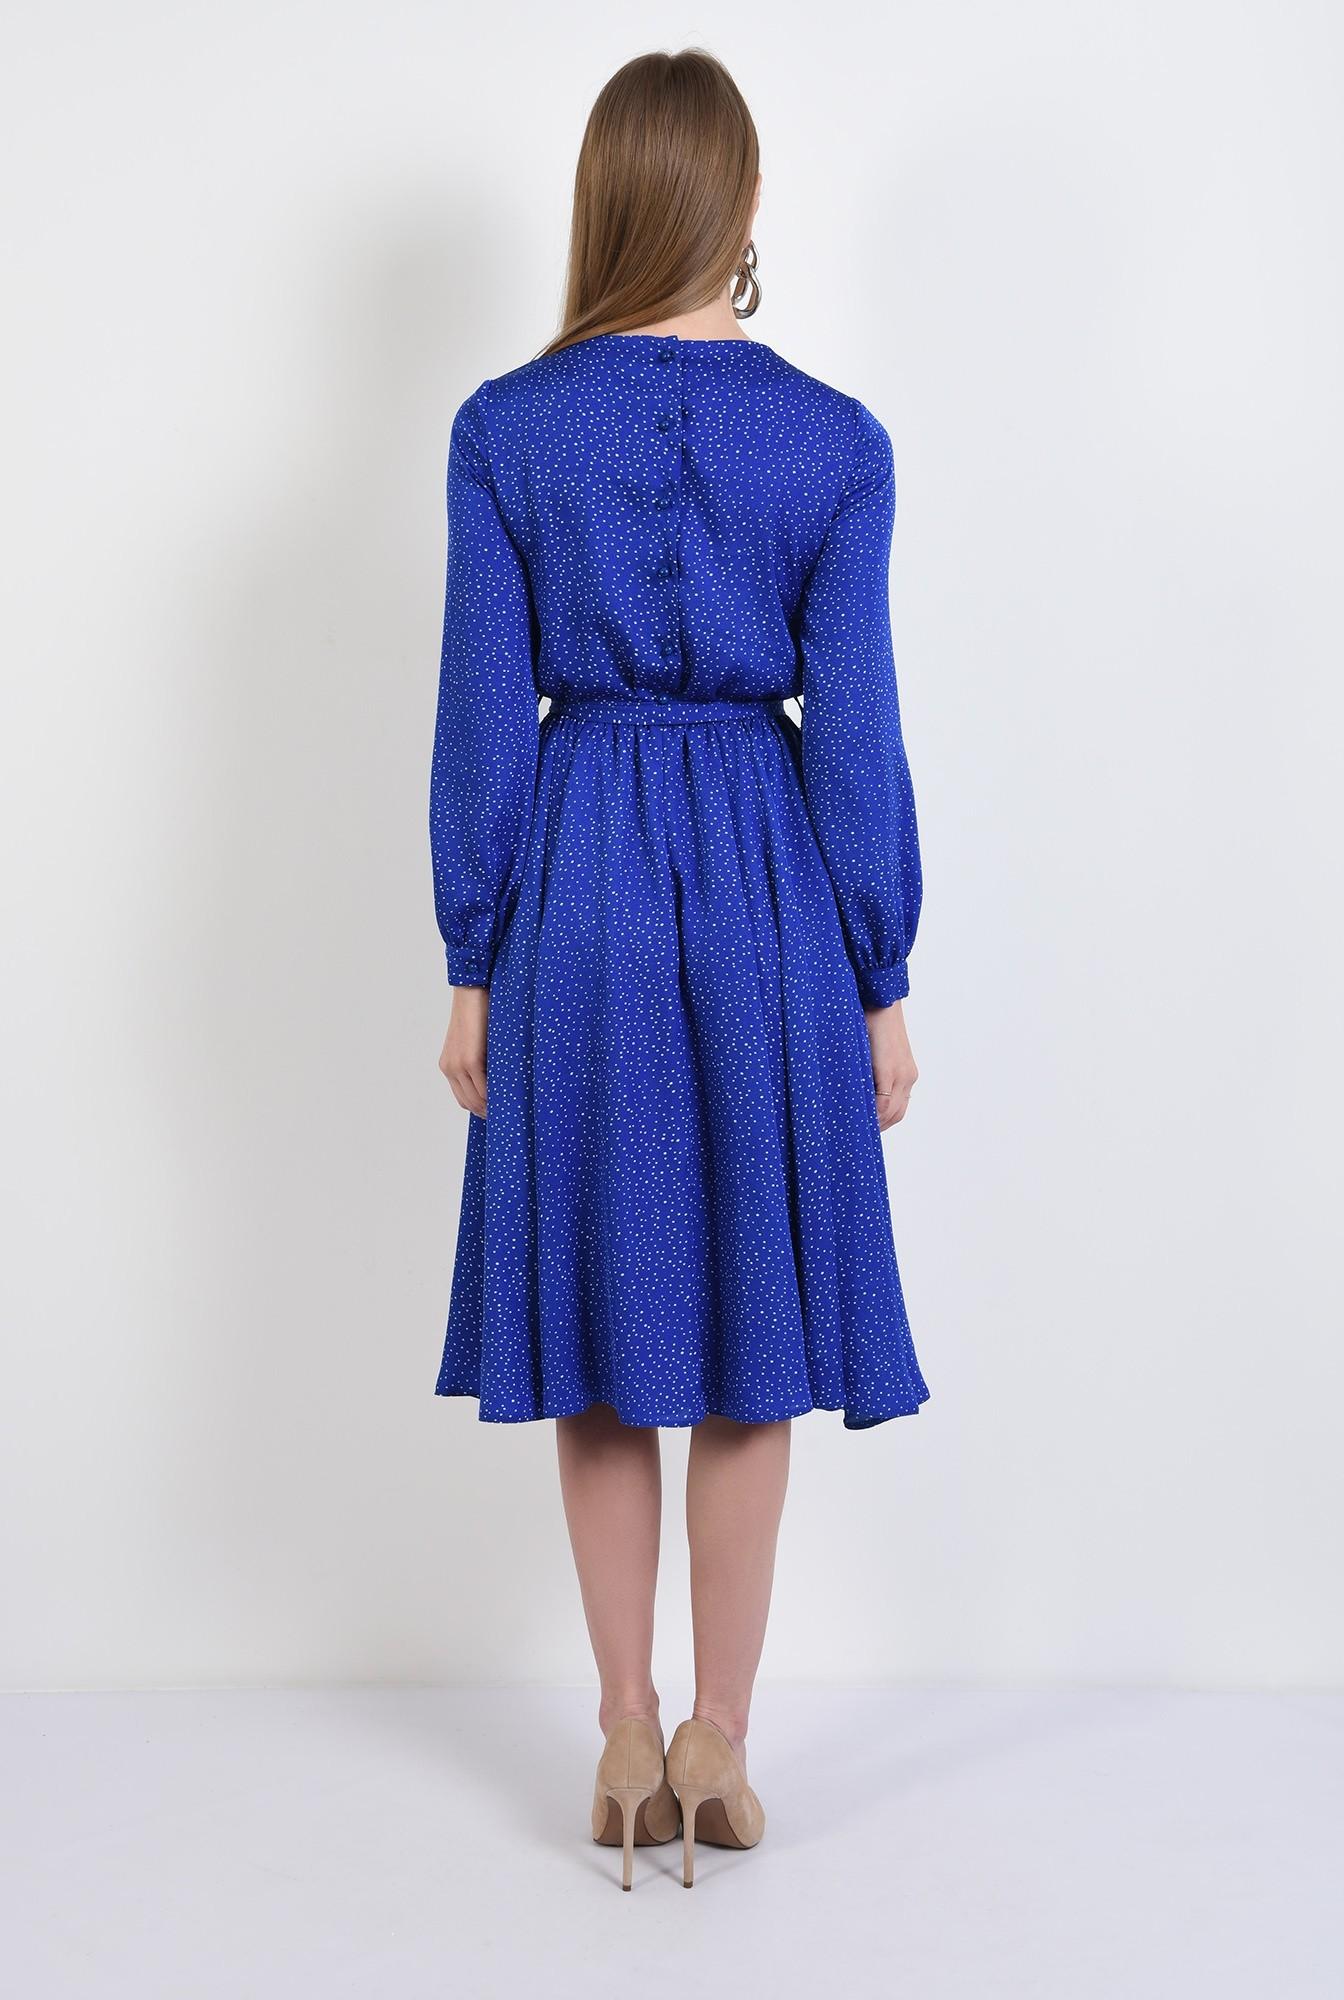 1 - 360 - rochie midi, clos, cu buline, cu nasturi la spate, rochie de primavara